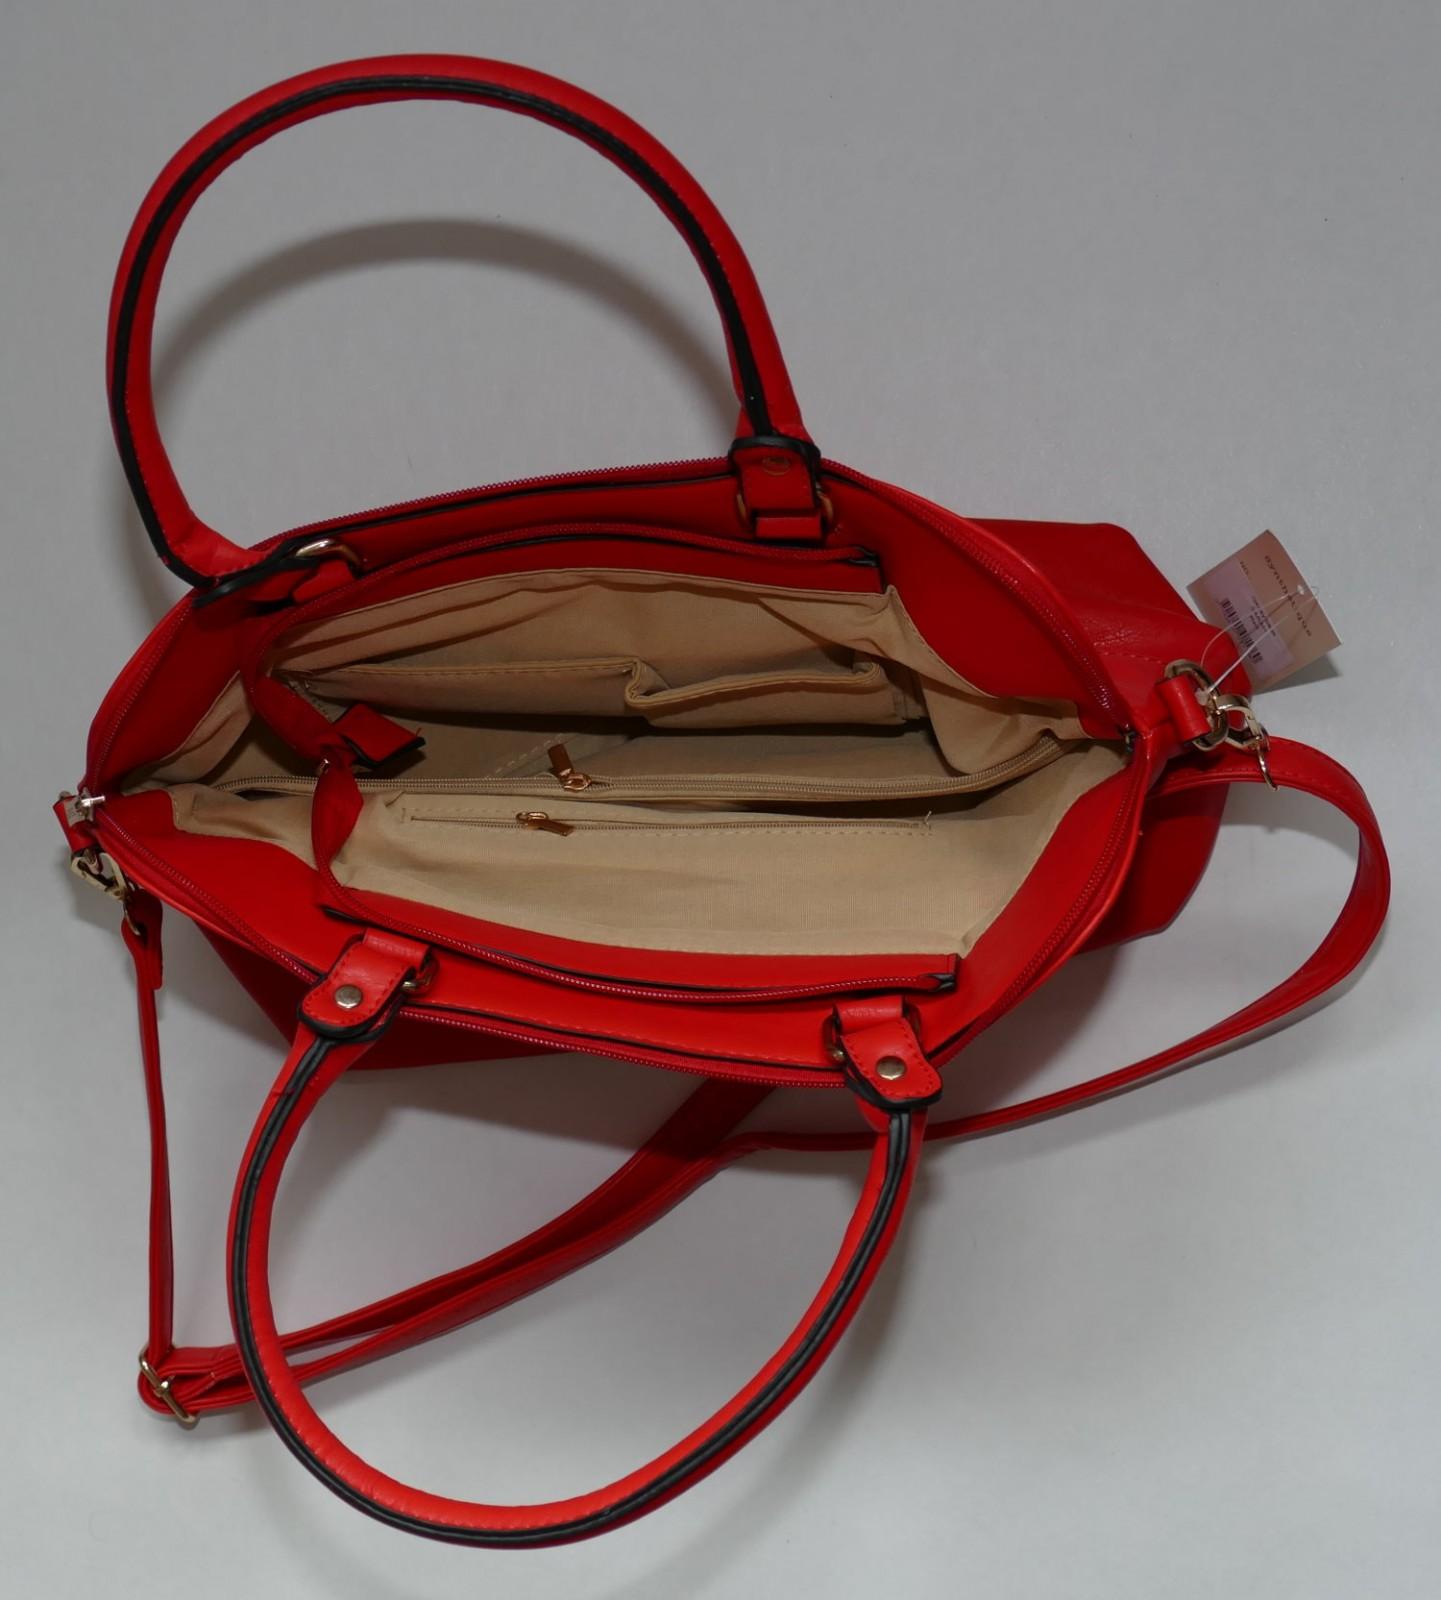 gessy bags fa 59054 sarah tasche handtasche schultertasche red taschen handtaschen schultertaschen. Black Bedroom Furniture Sets. Home Design Ideas